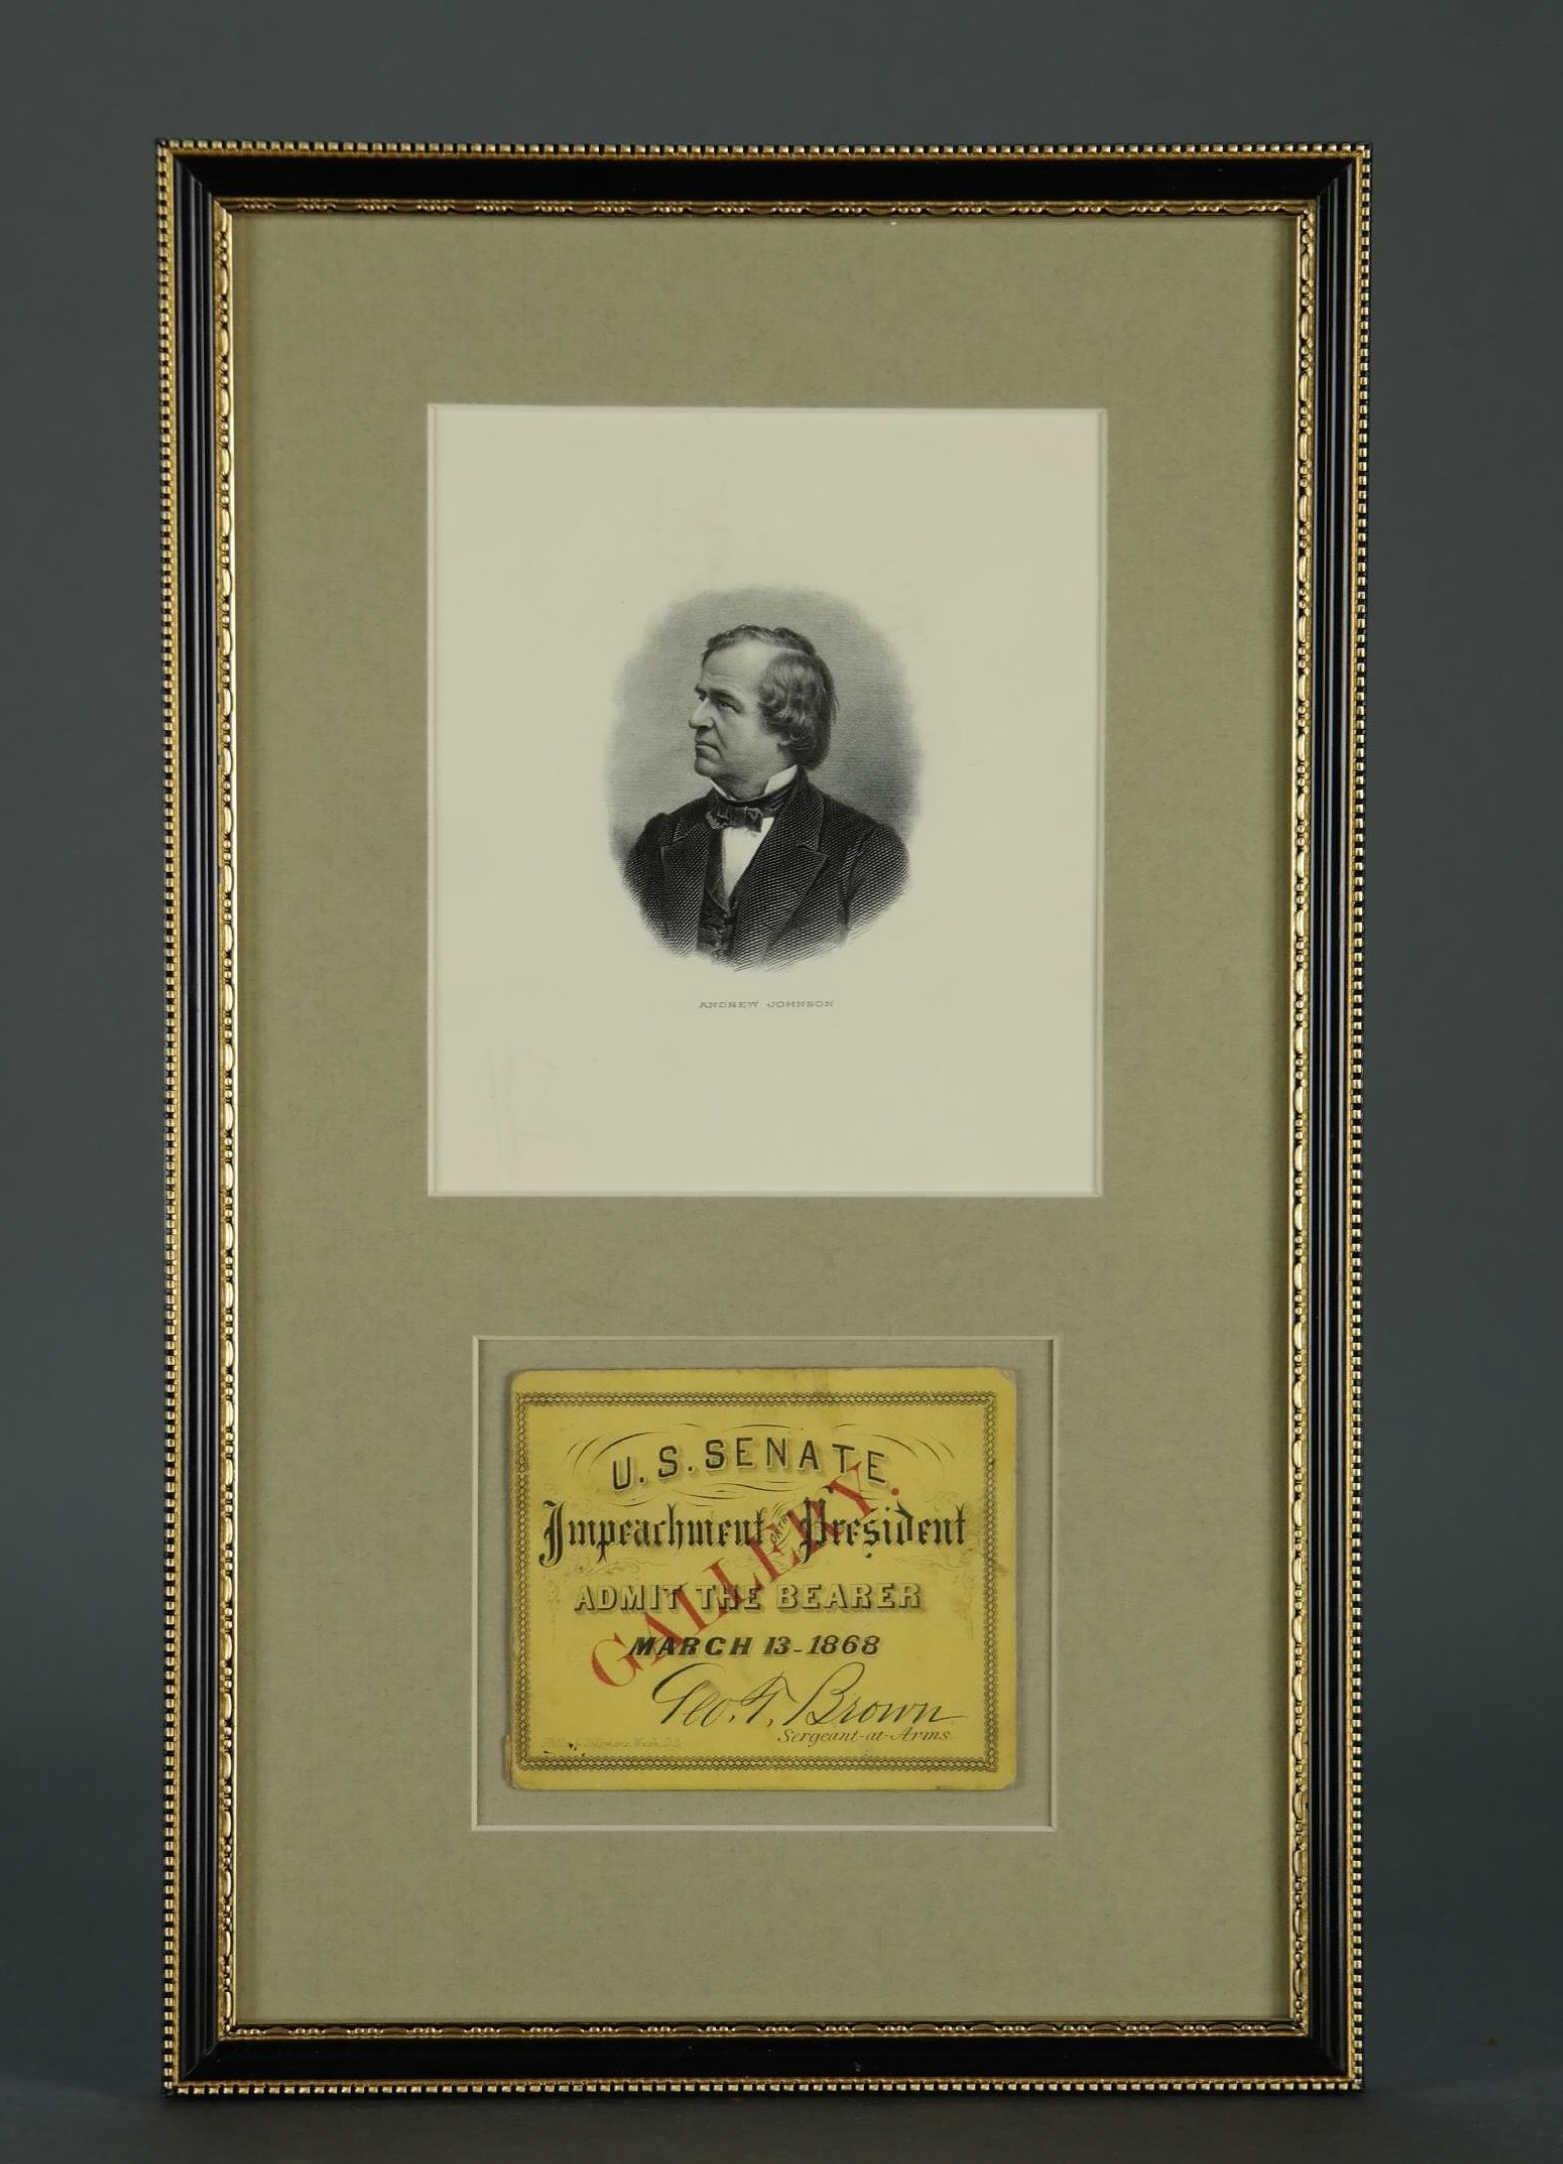 Andrew Johnson Impeachment Ticket. March 13, 1868.